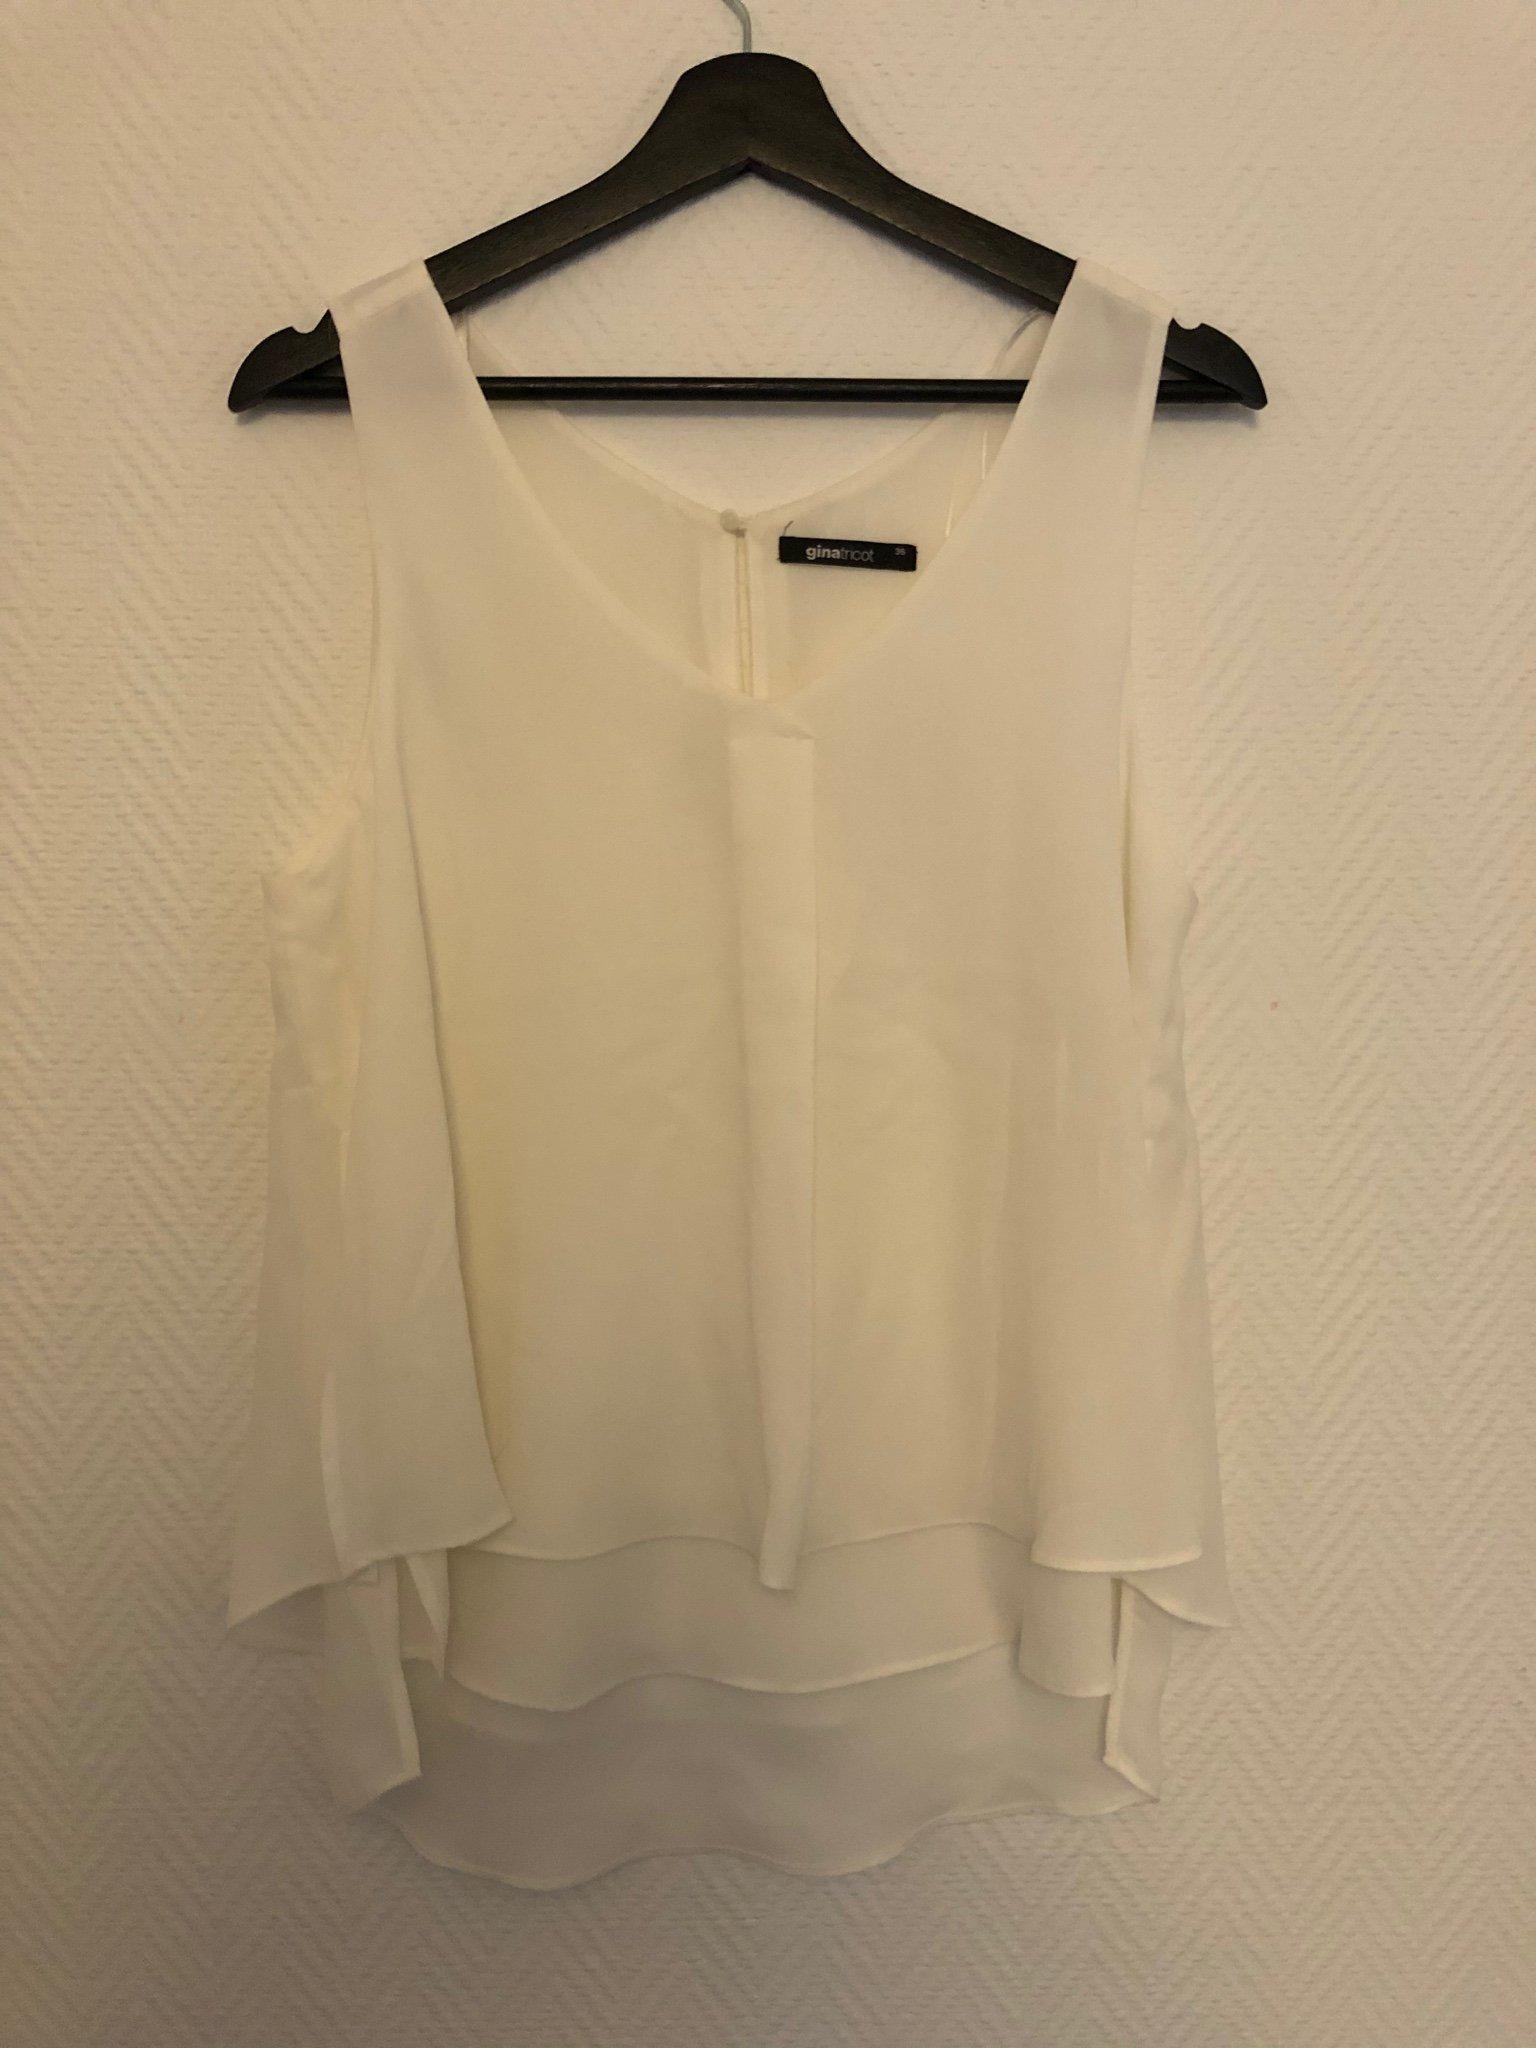 Linne Topp från Gina tricot, vit, stl 36